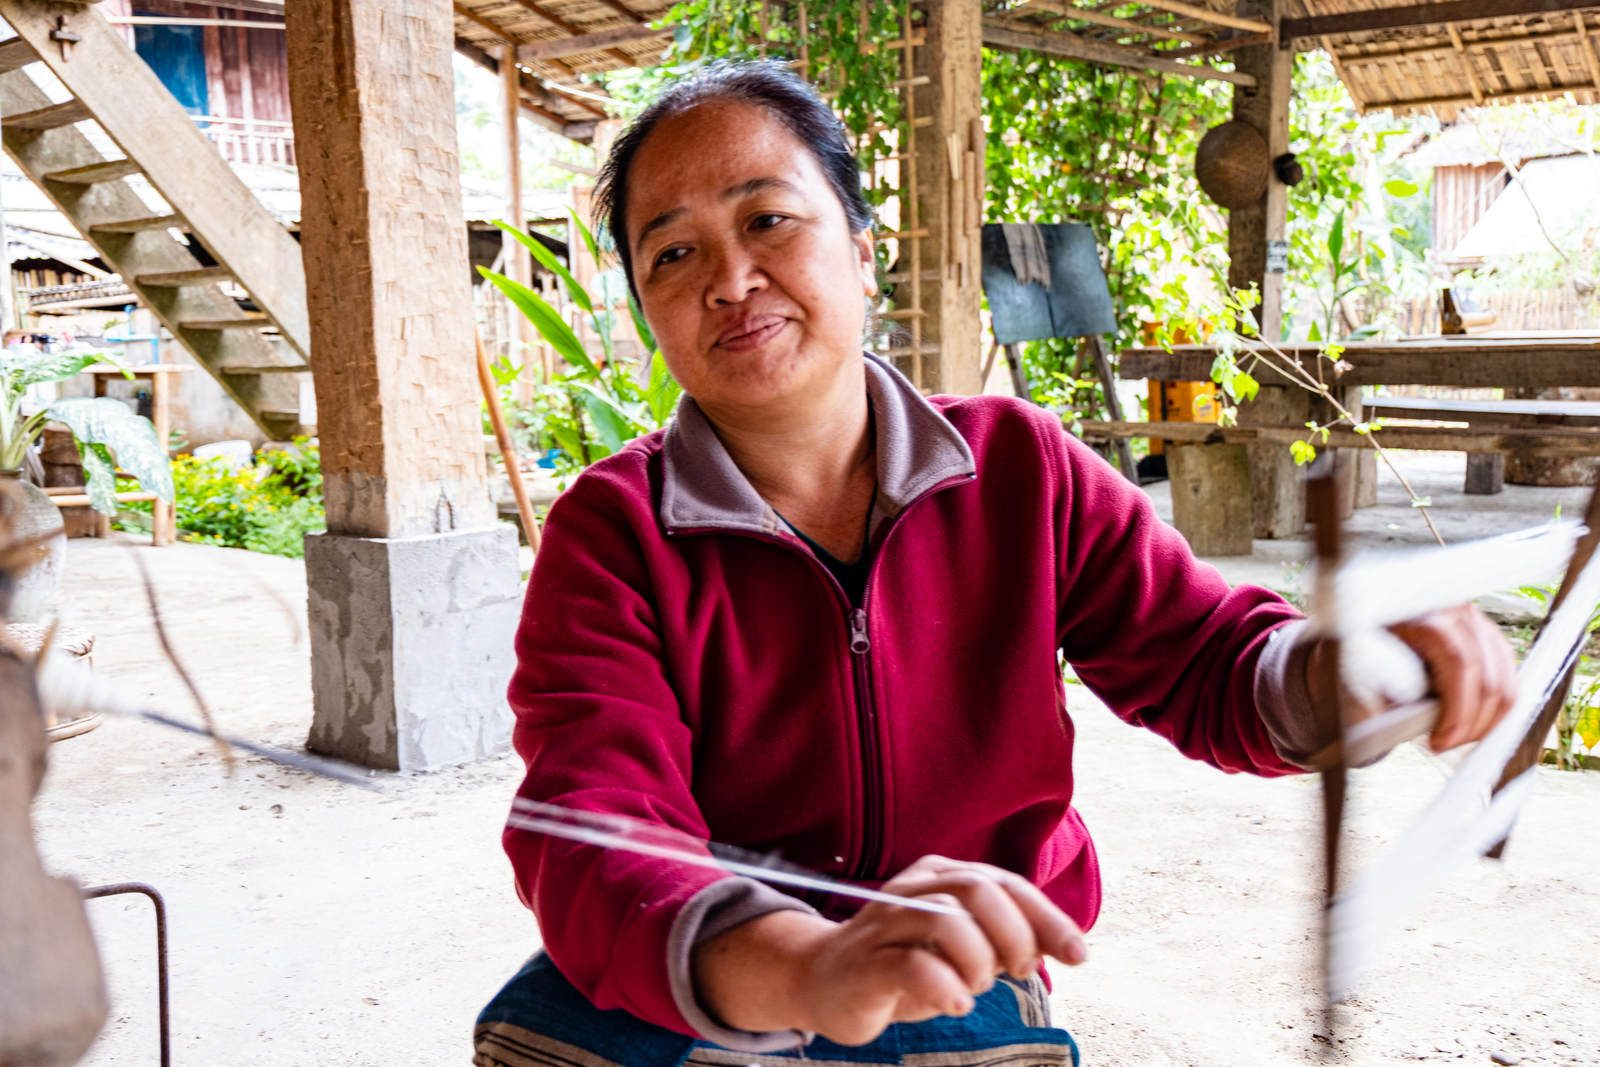 Aude Schaeffer - Muudana - Confidences d une créatrice inspirante — Artisane Tissage Manuel Cambodge Laos